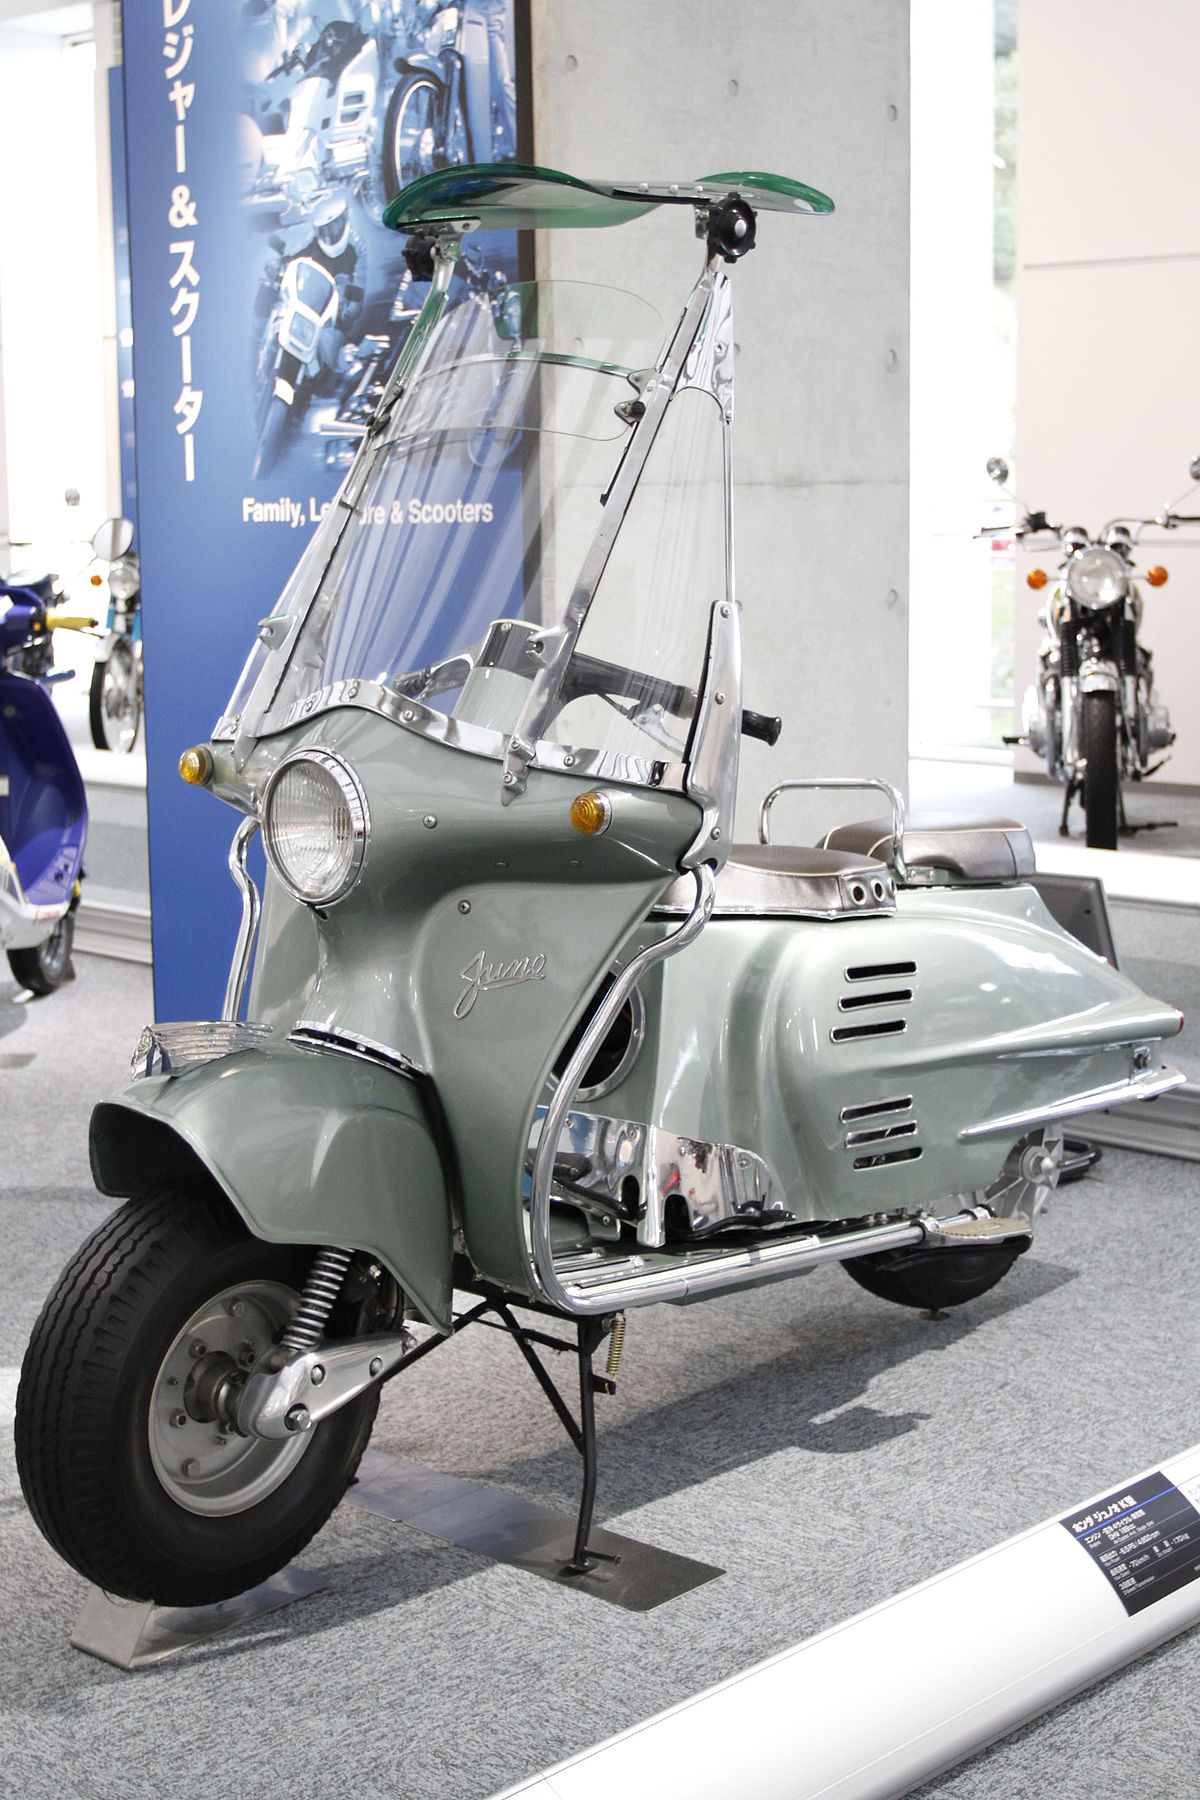 Electric Motor Scooter >> Honda Juno - Wikipedia